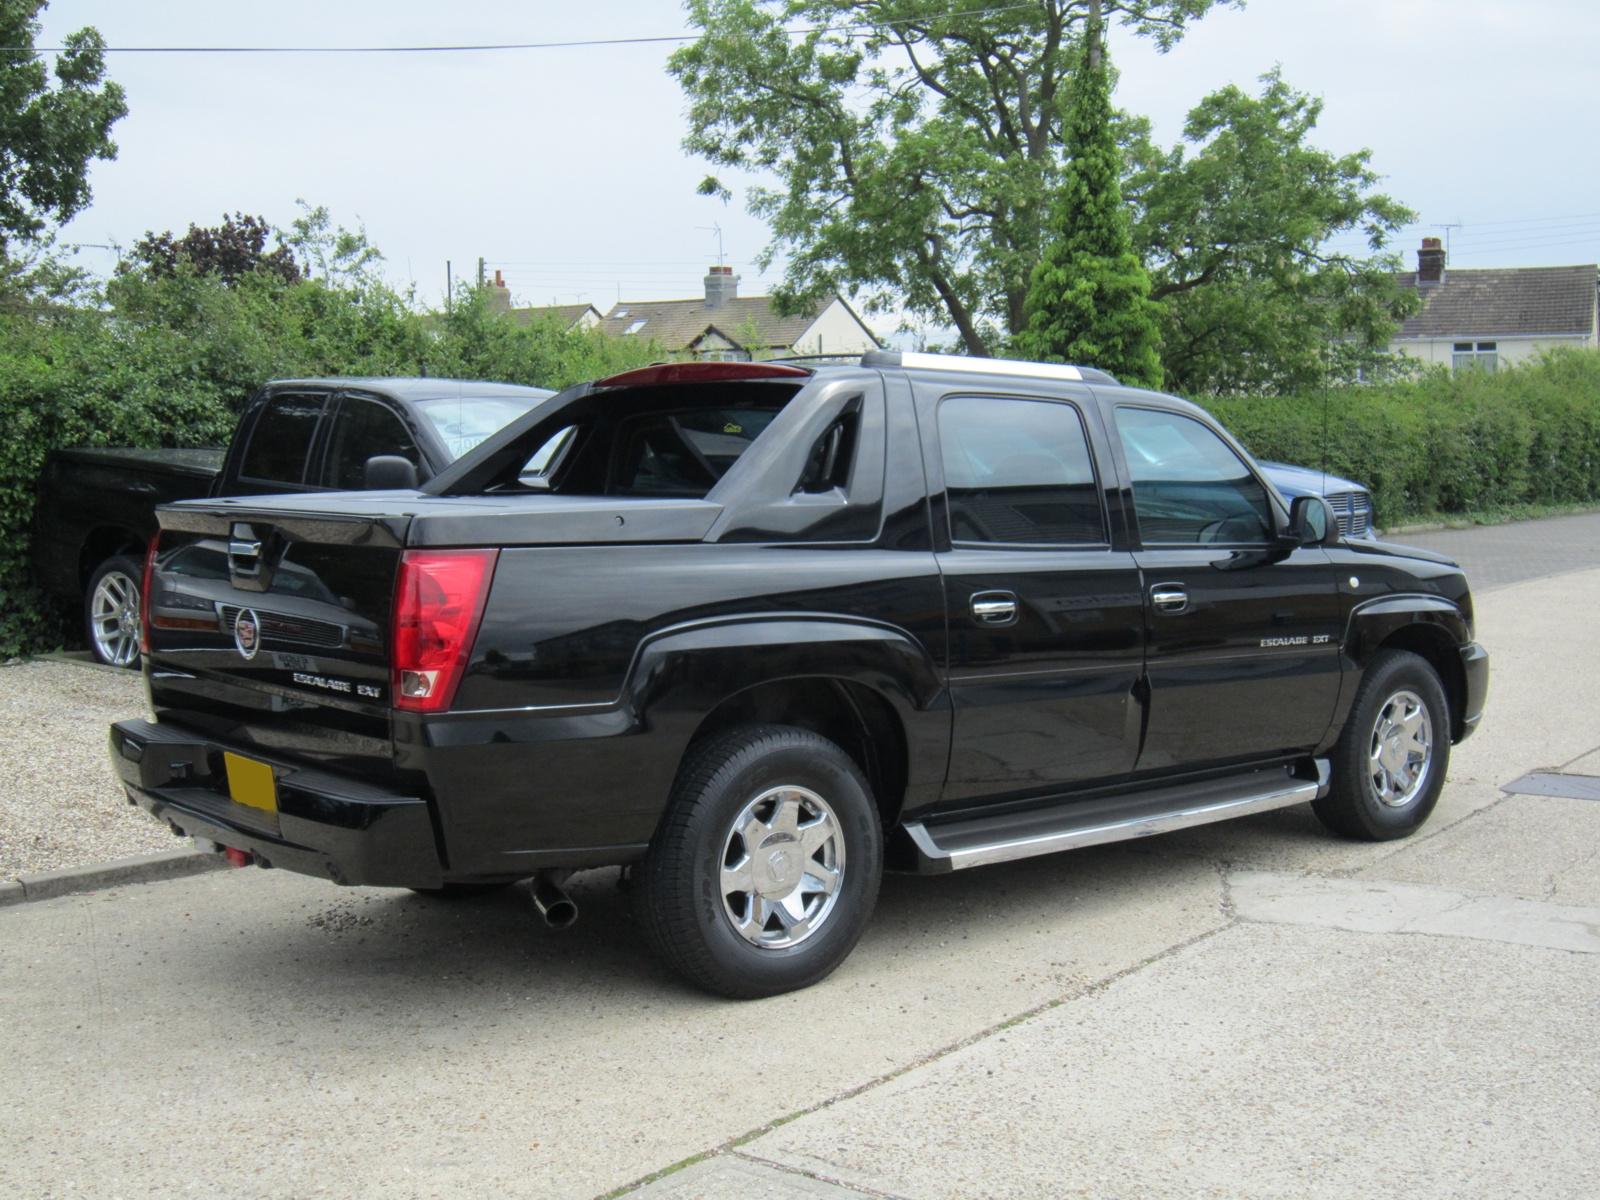 Chevrolet Avalanche Black